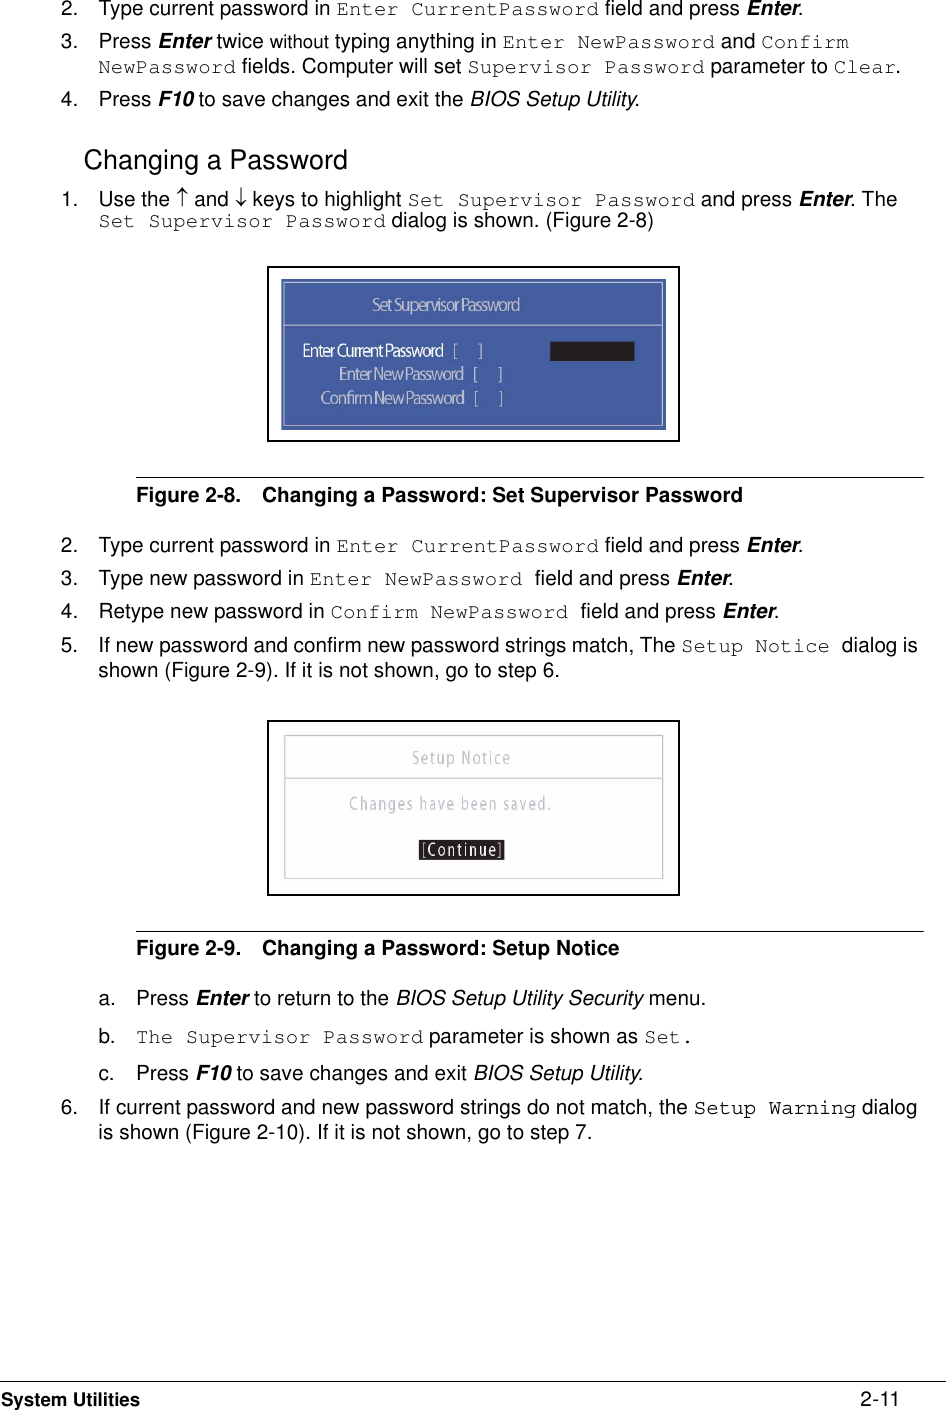 Acer 522 Users Manual JE01_BZ_FCS